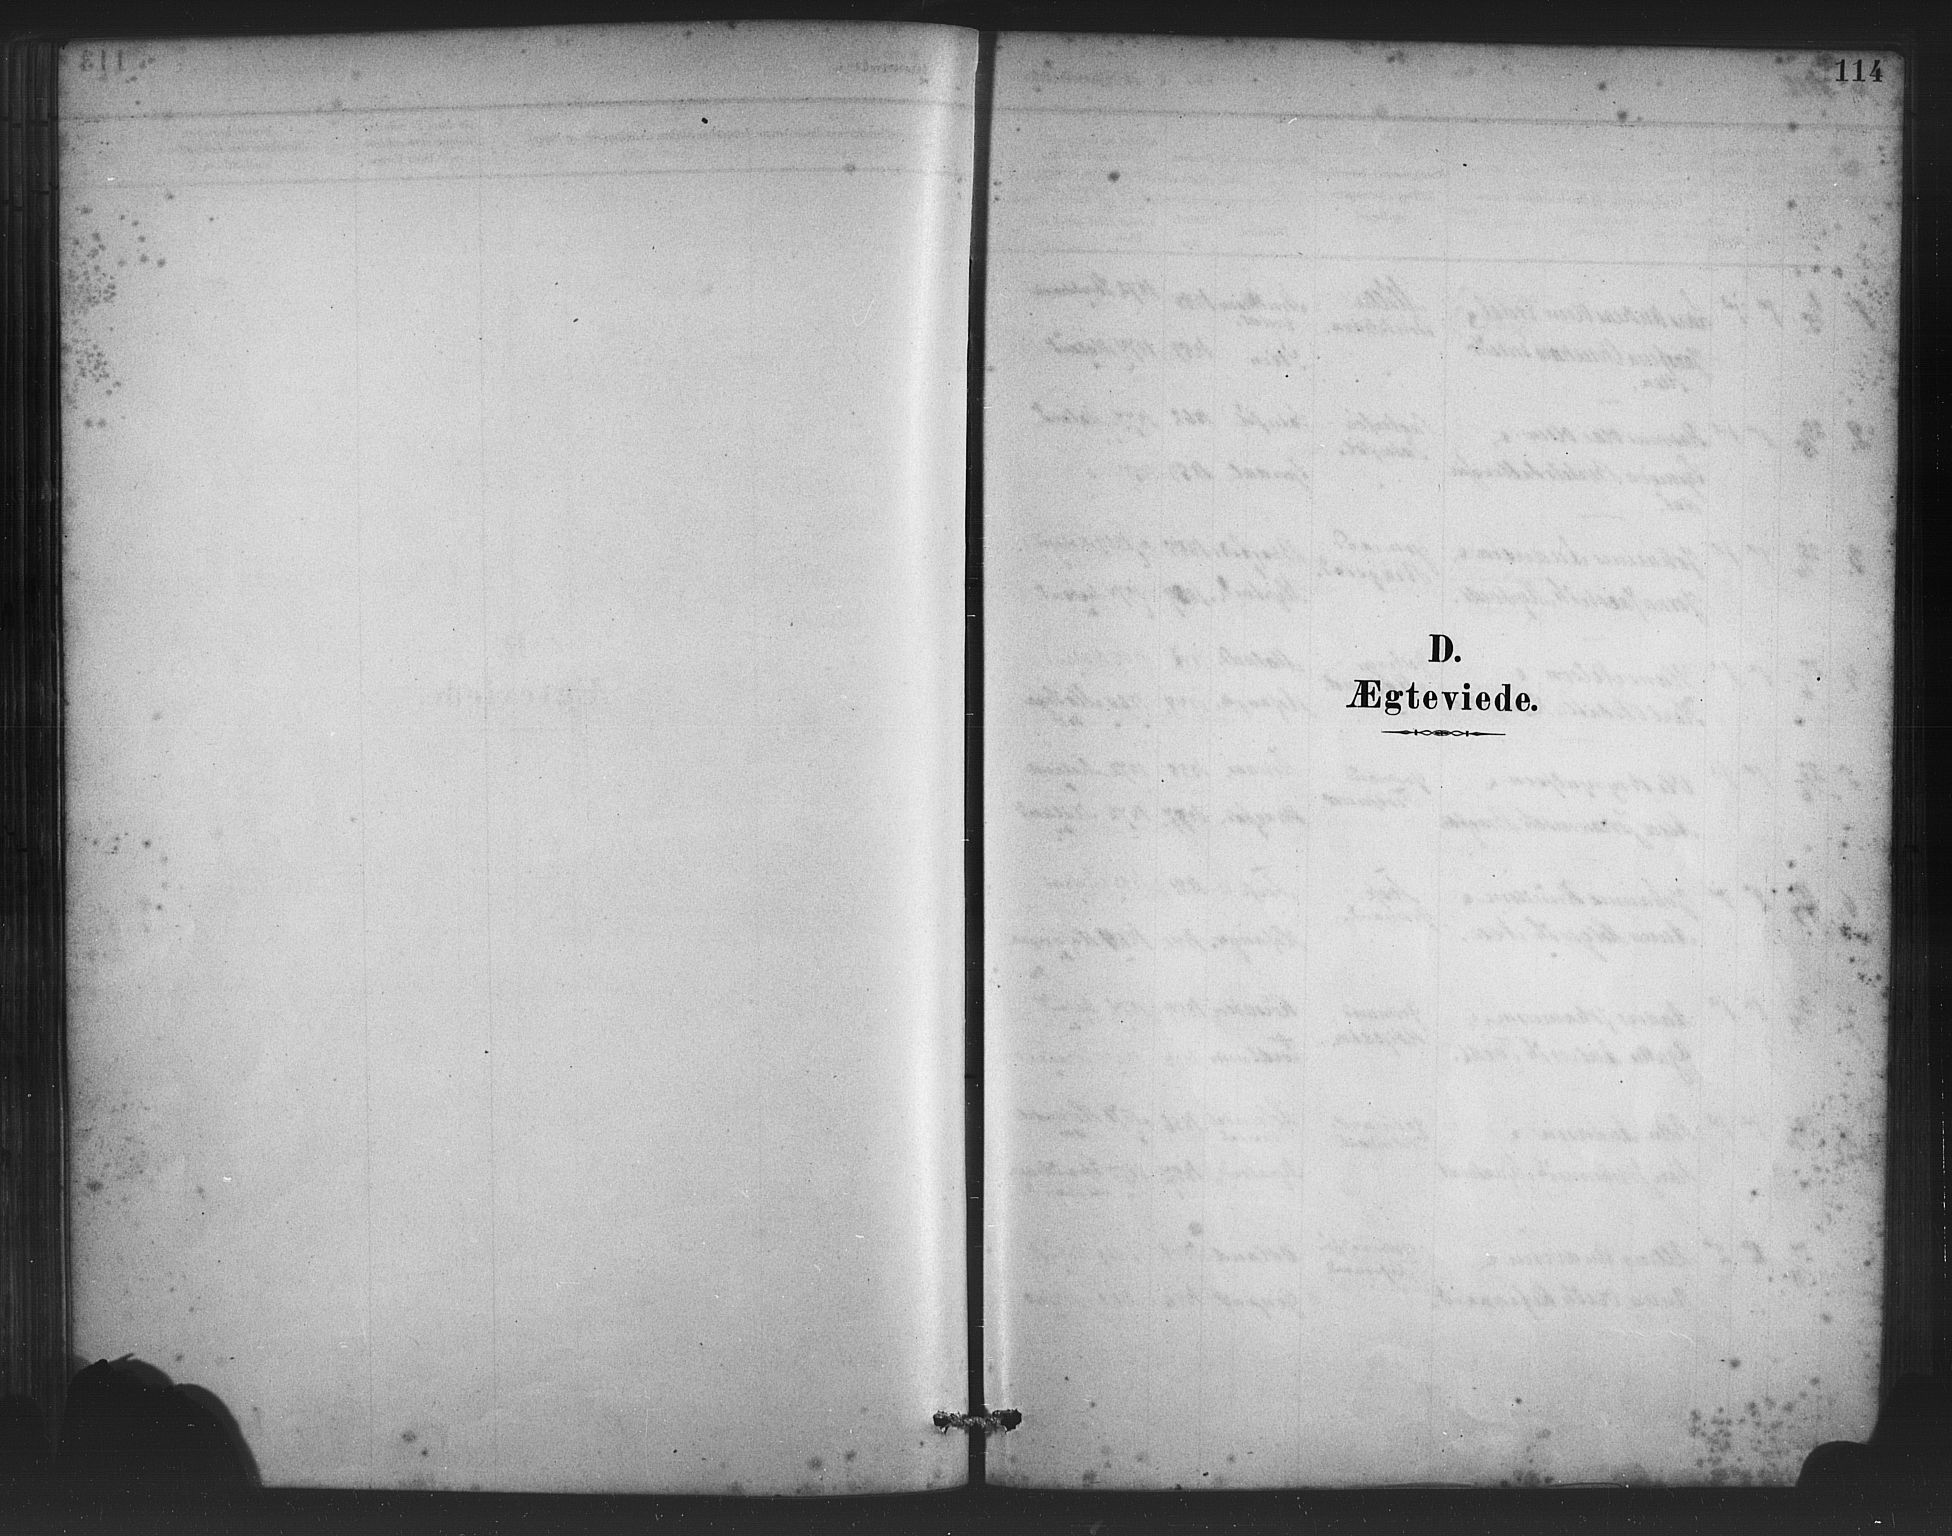 SAB, Alversund Sokneprestembete, H/Ha/Haa/Haac/L0001: Ministerialbok nr. C 1, 1882-1900, s. 114